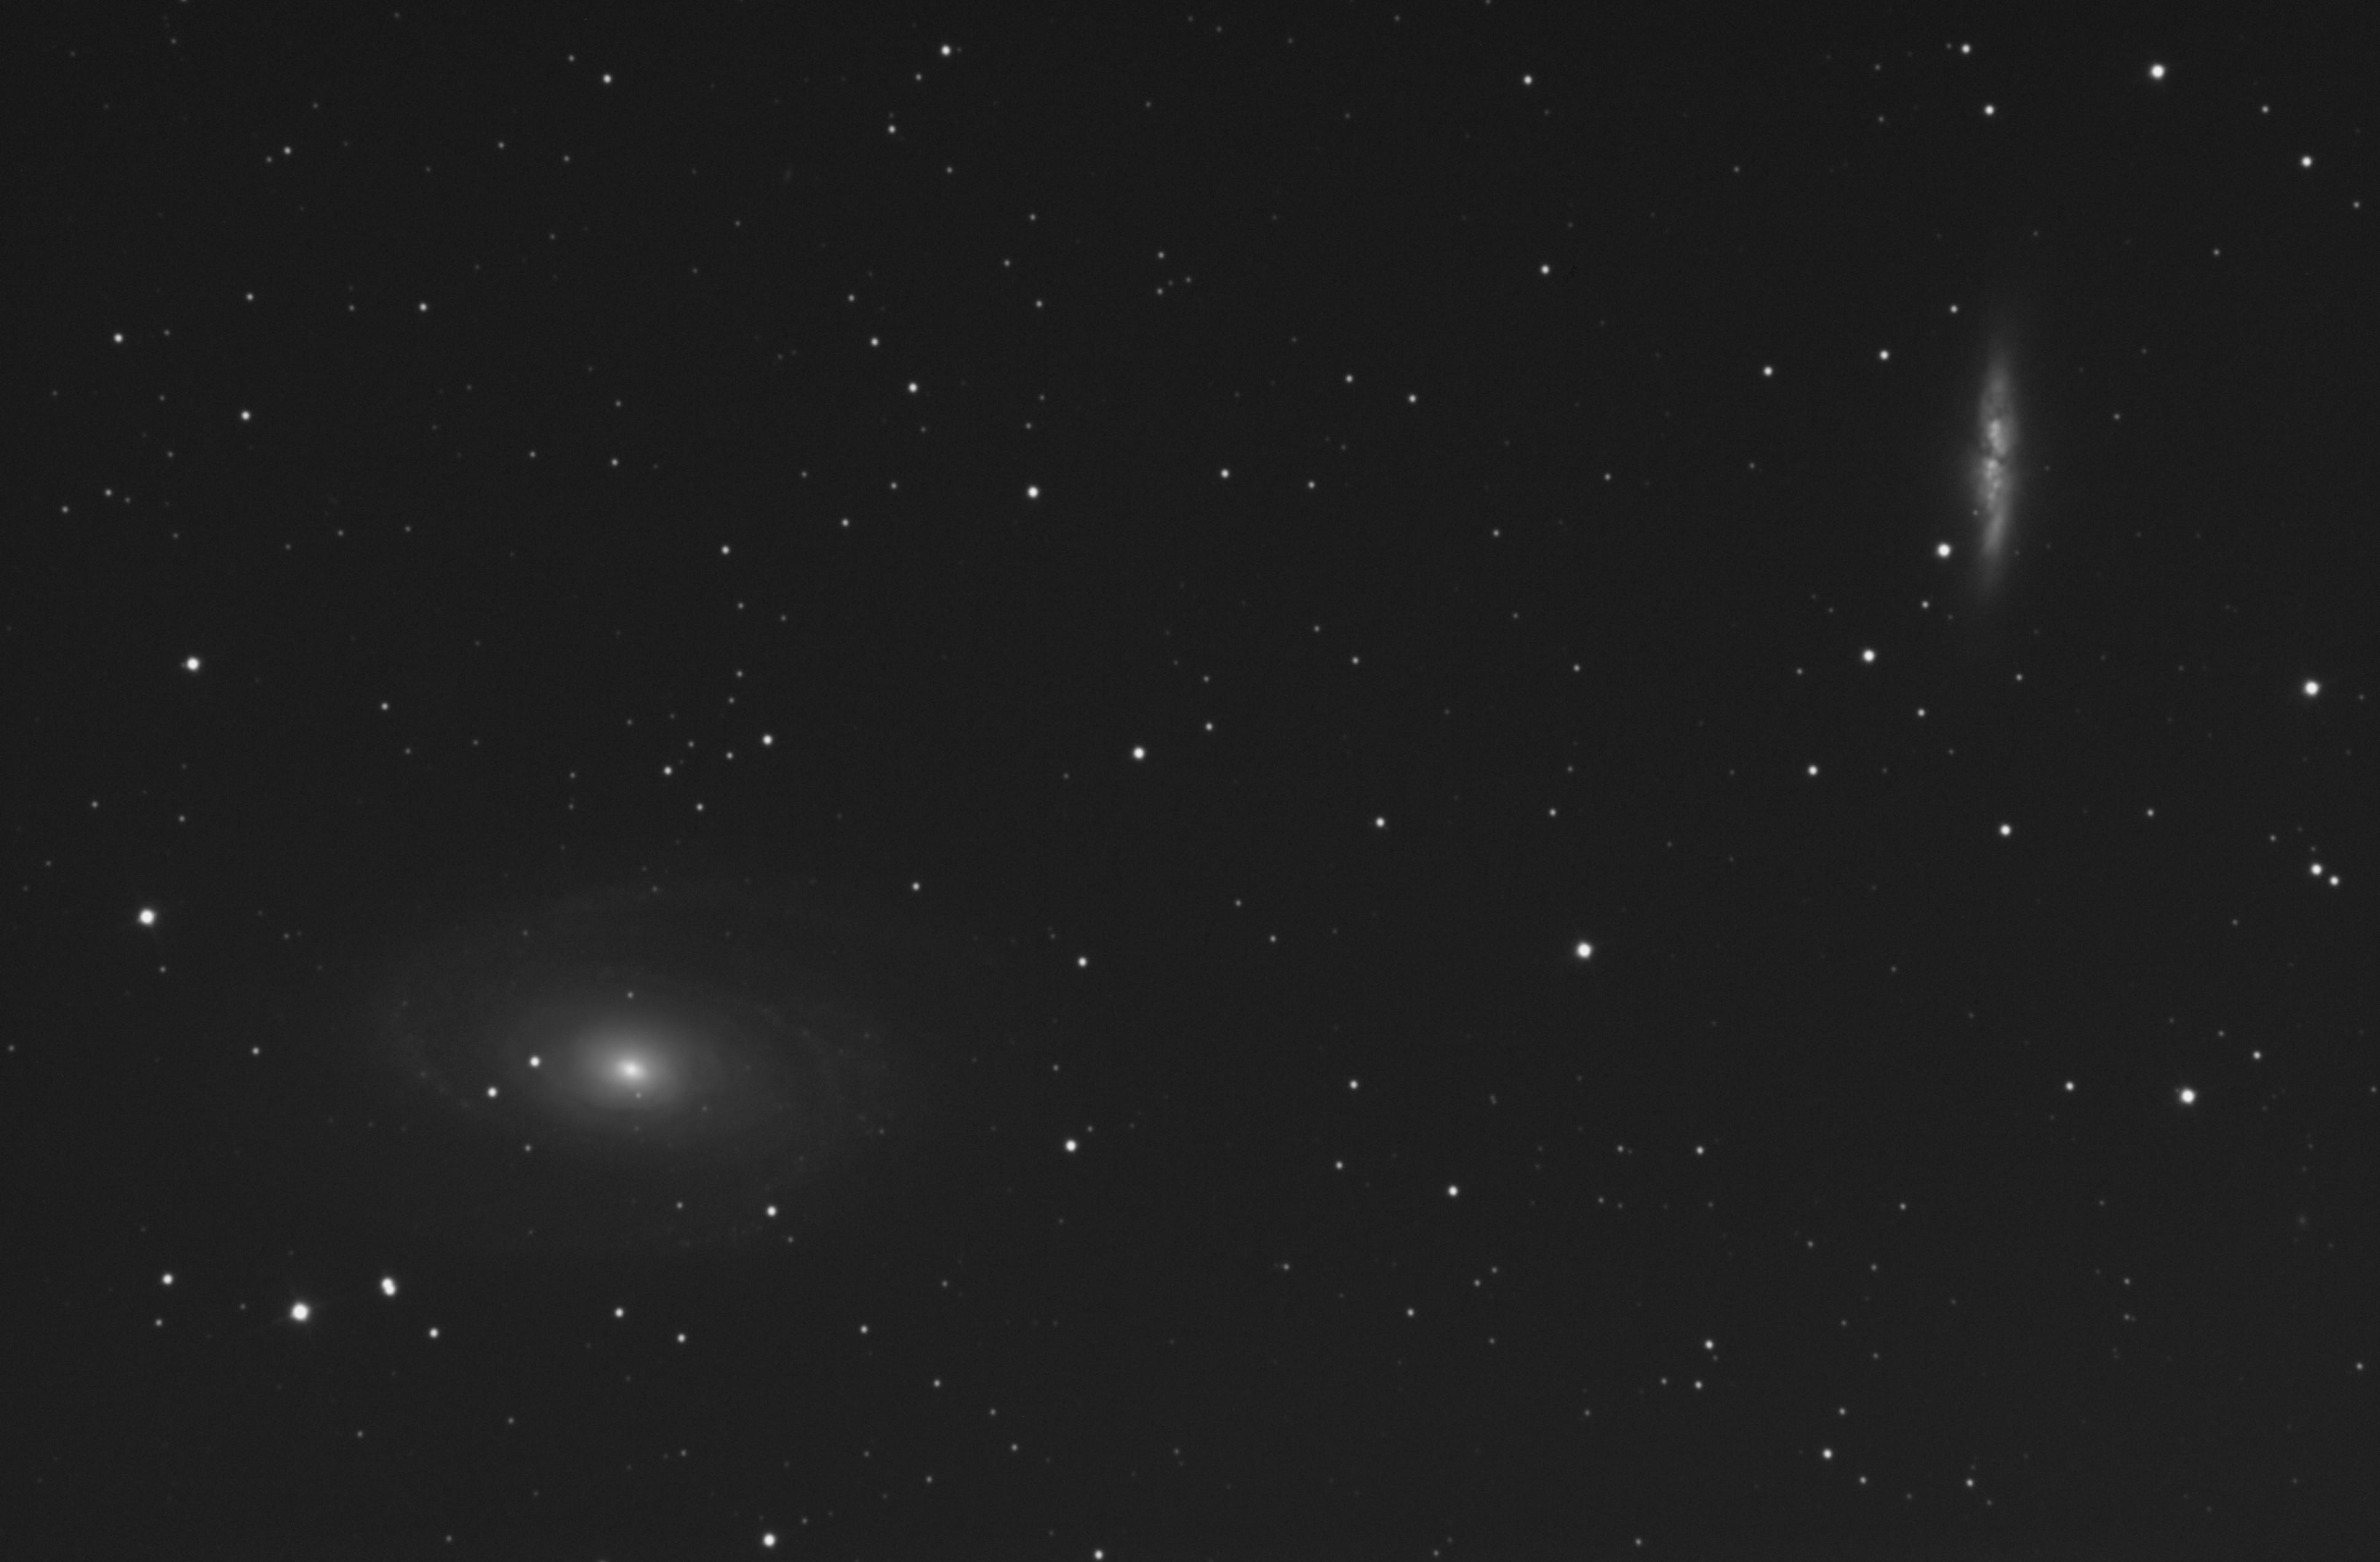 M81_bw.jpg